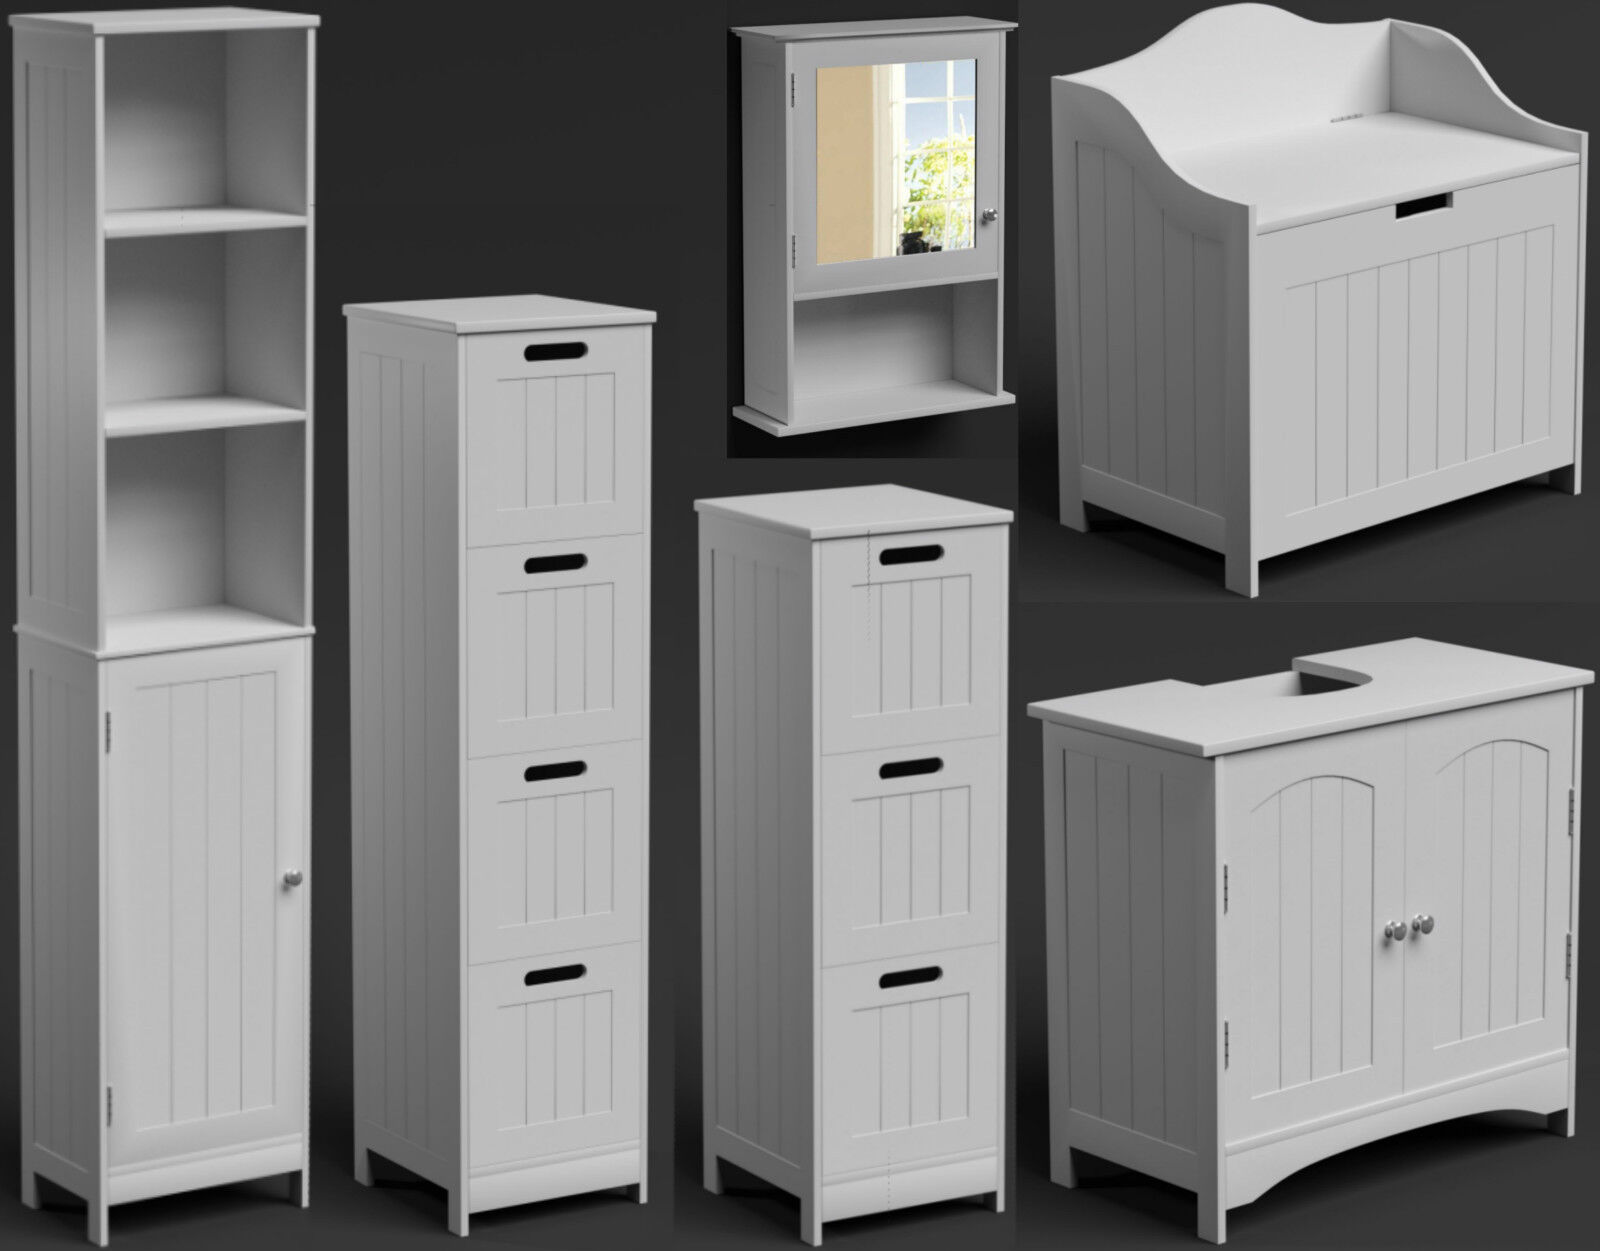 Bathroom Furniture Suite Set White Free Standing Storage Cupboard Cabinet Unit Cabinets